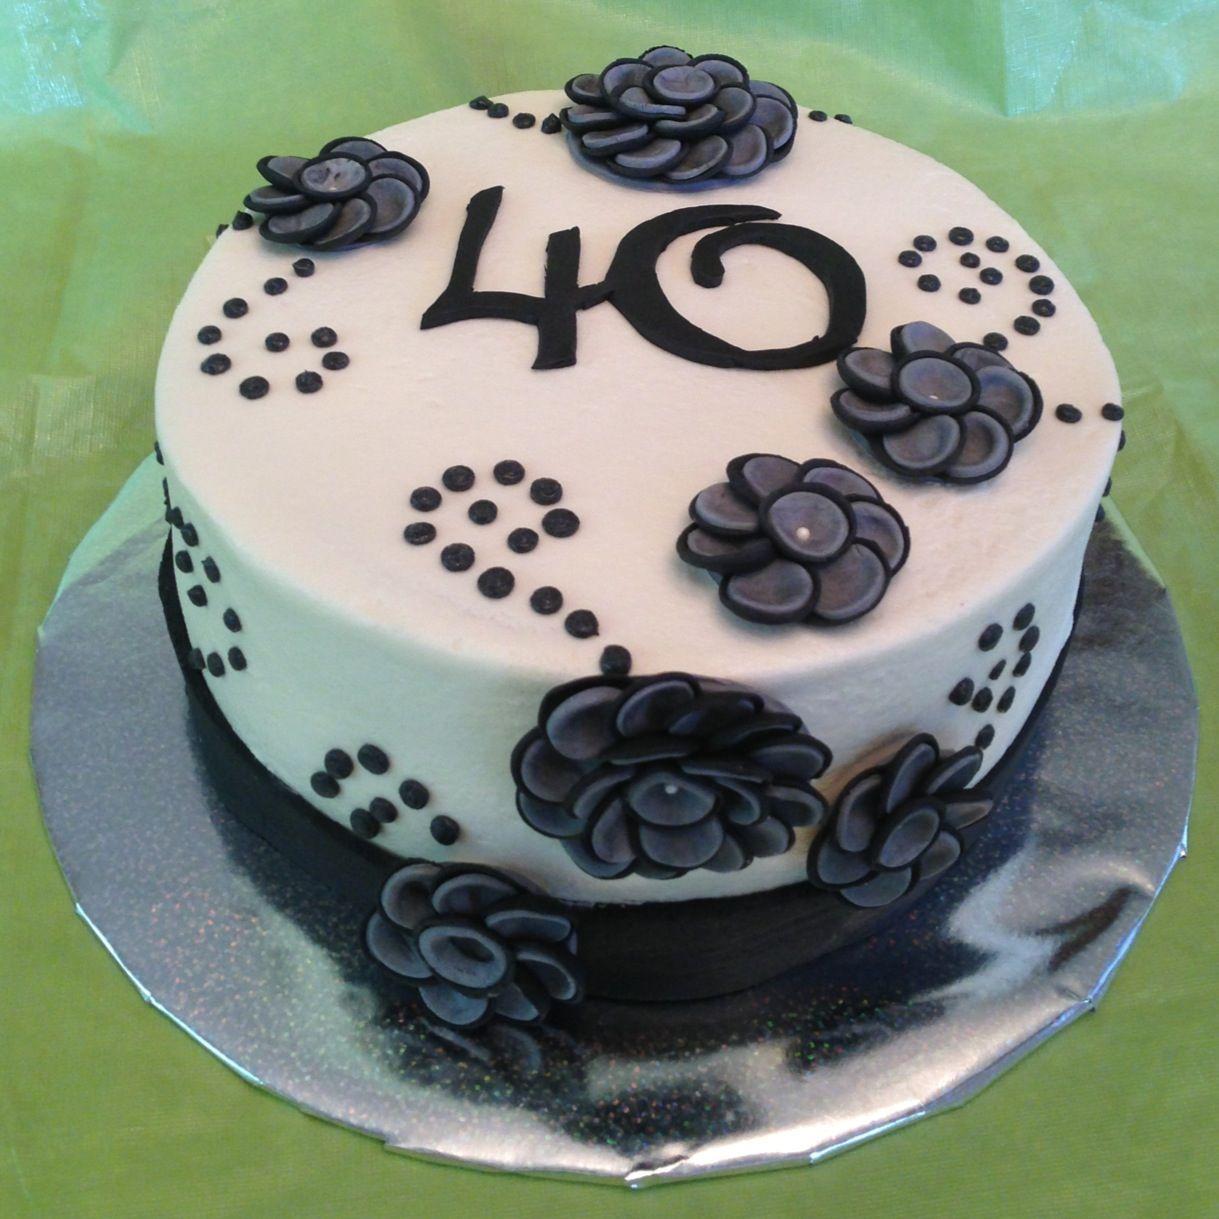 Cake Design Ideas For 40th Birthday : 40th birthday cake Cake Ideas Pinterest